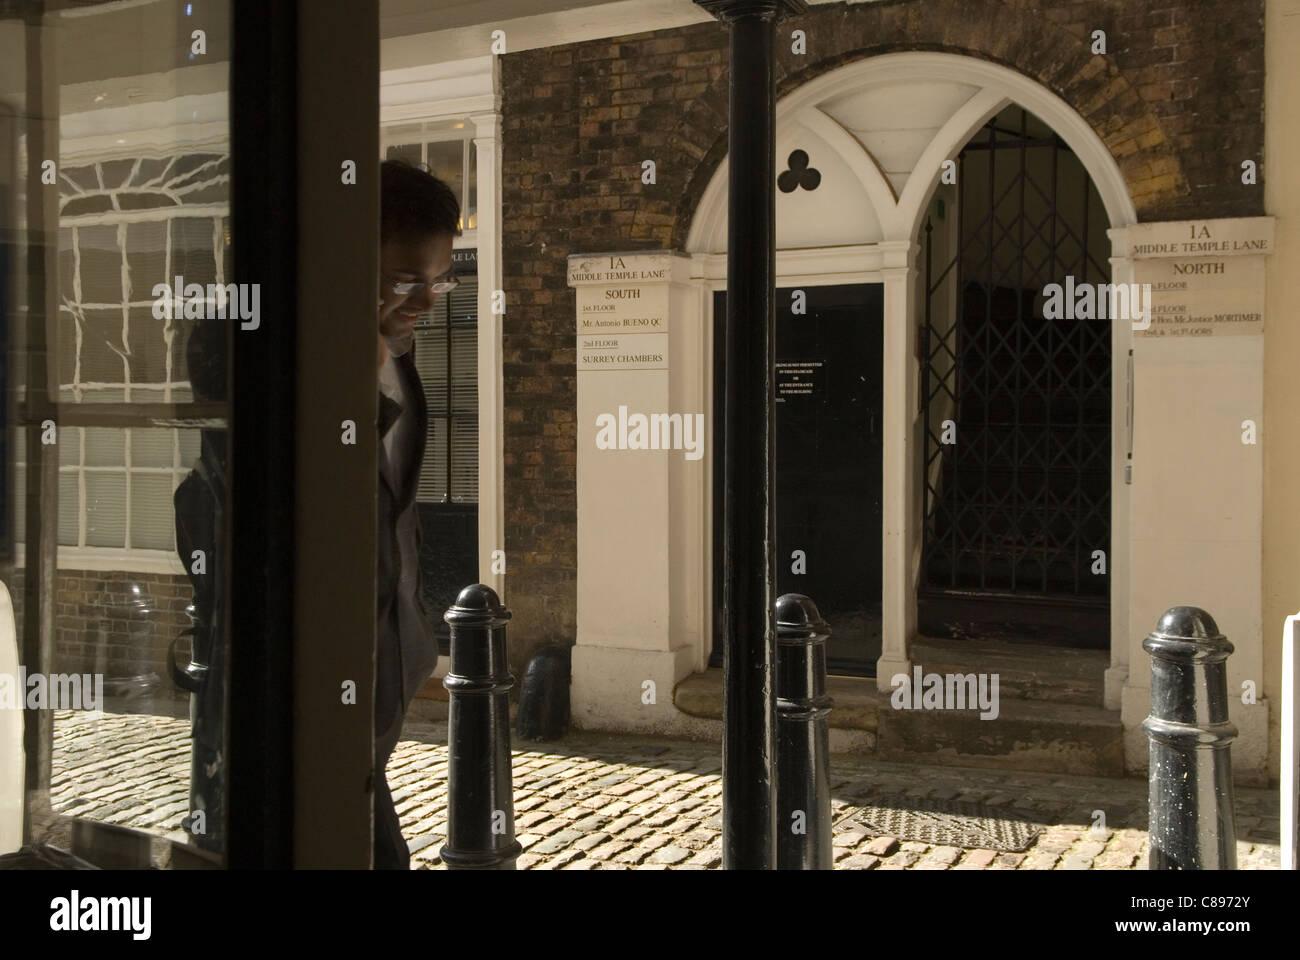 Middle Temple Lane. Inns of Court. London UK.  HOMER SYKES - Stock Image